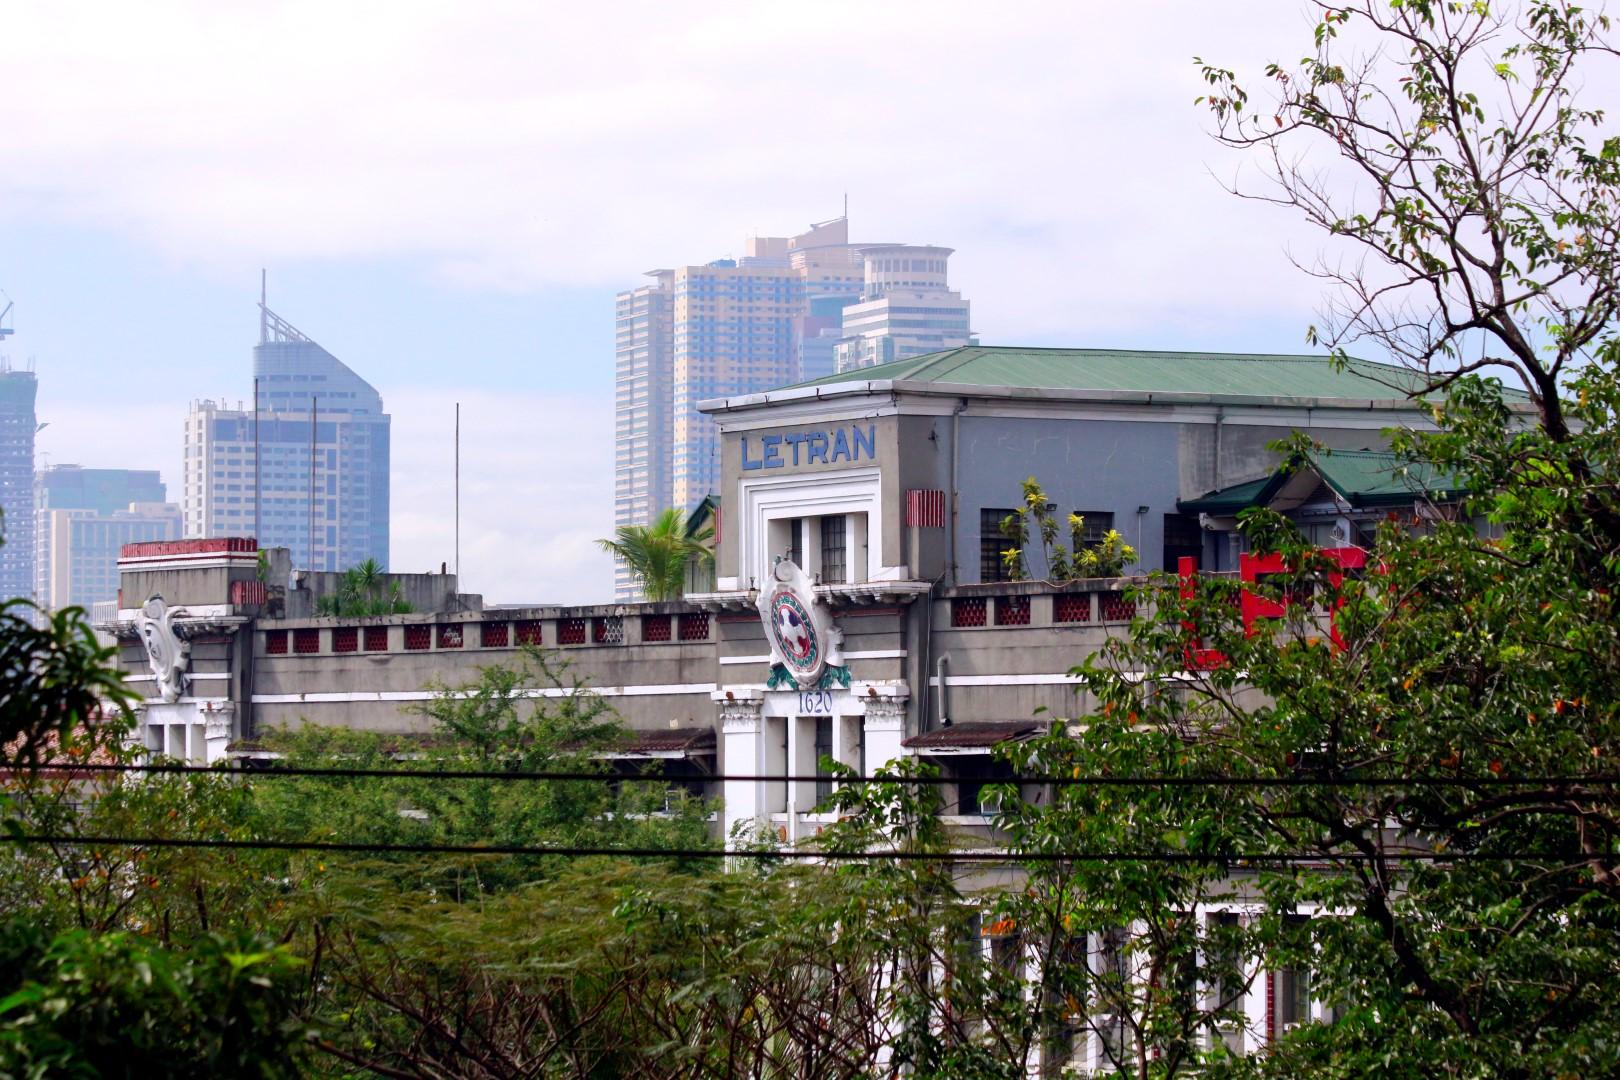 colegio de san juan de letran Things to do near colegio de san juan de letran on tripadvisor: see 34,382 reviews and 19,540 candid photos of things to do near colegio de san juan de letran in manila, philippines.